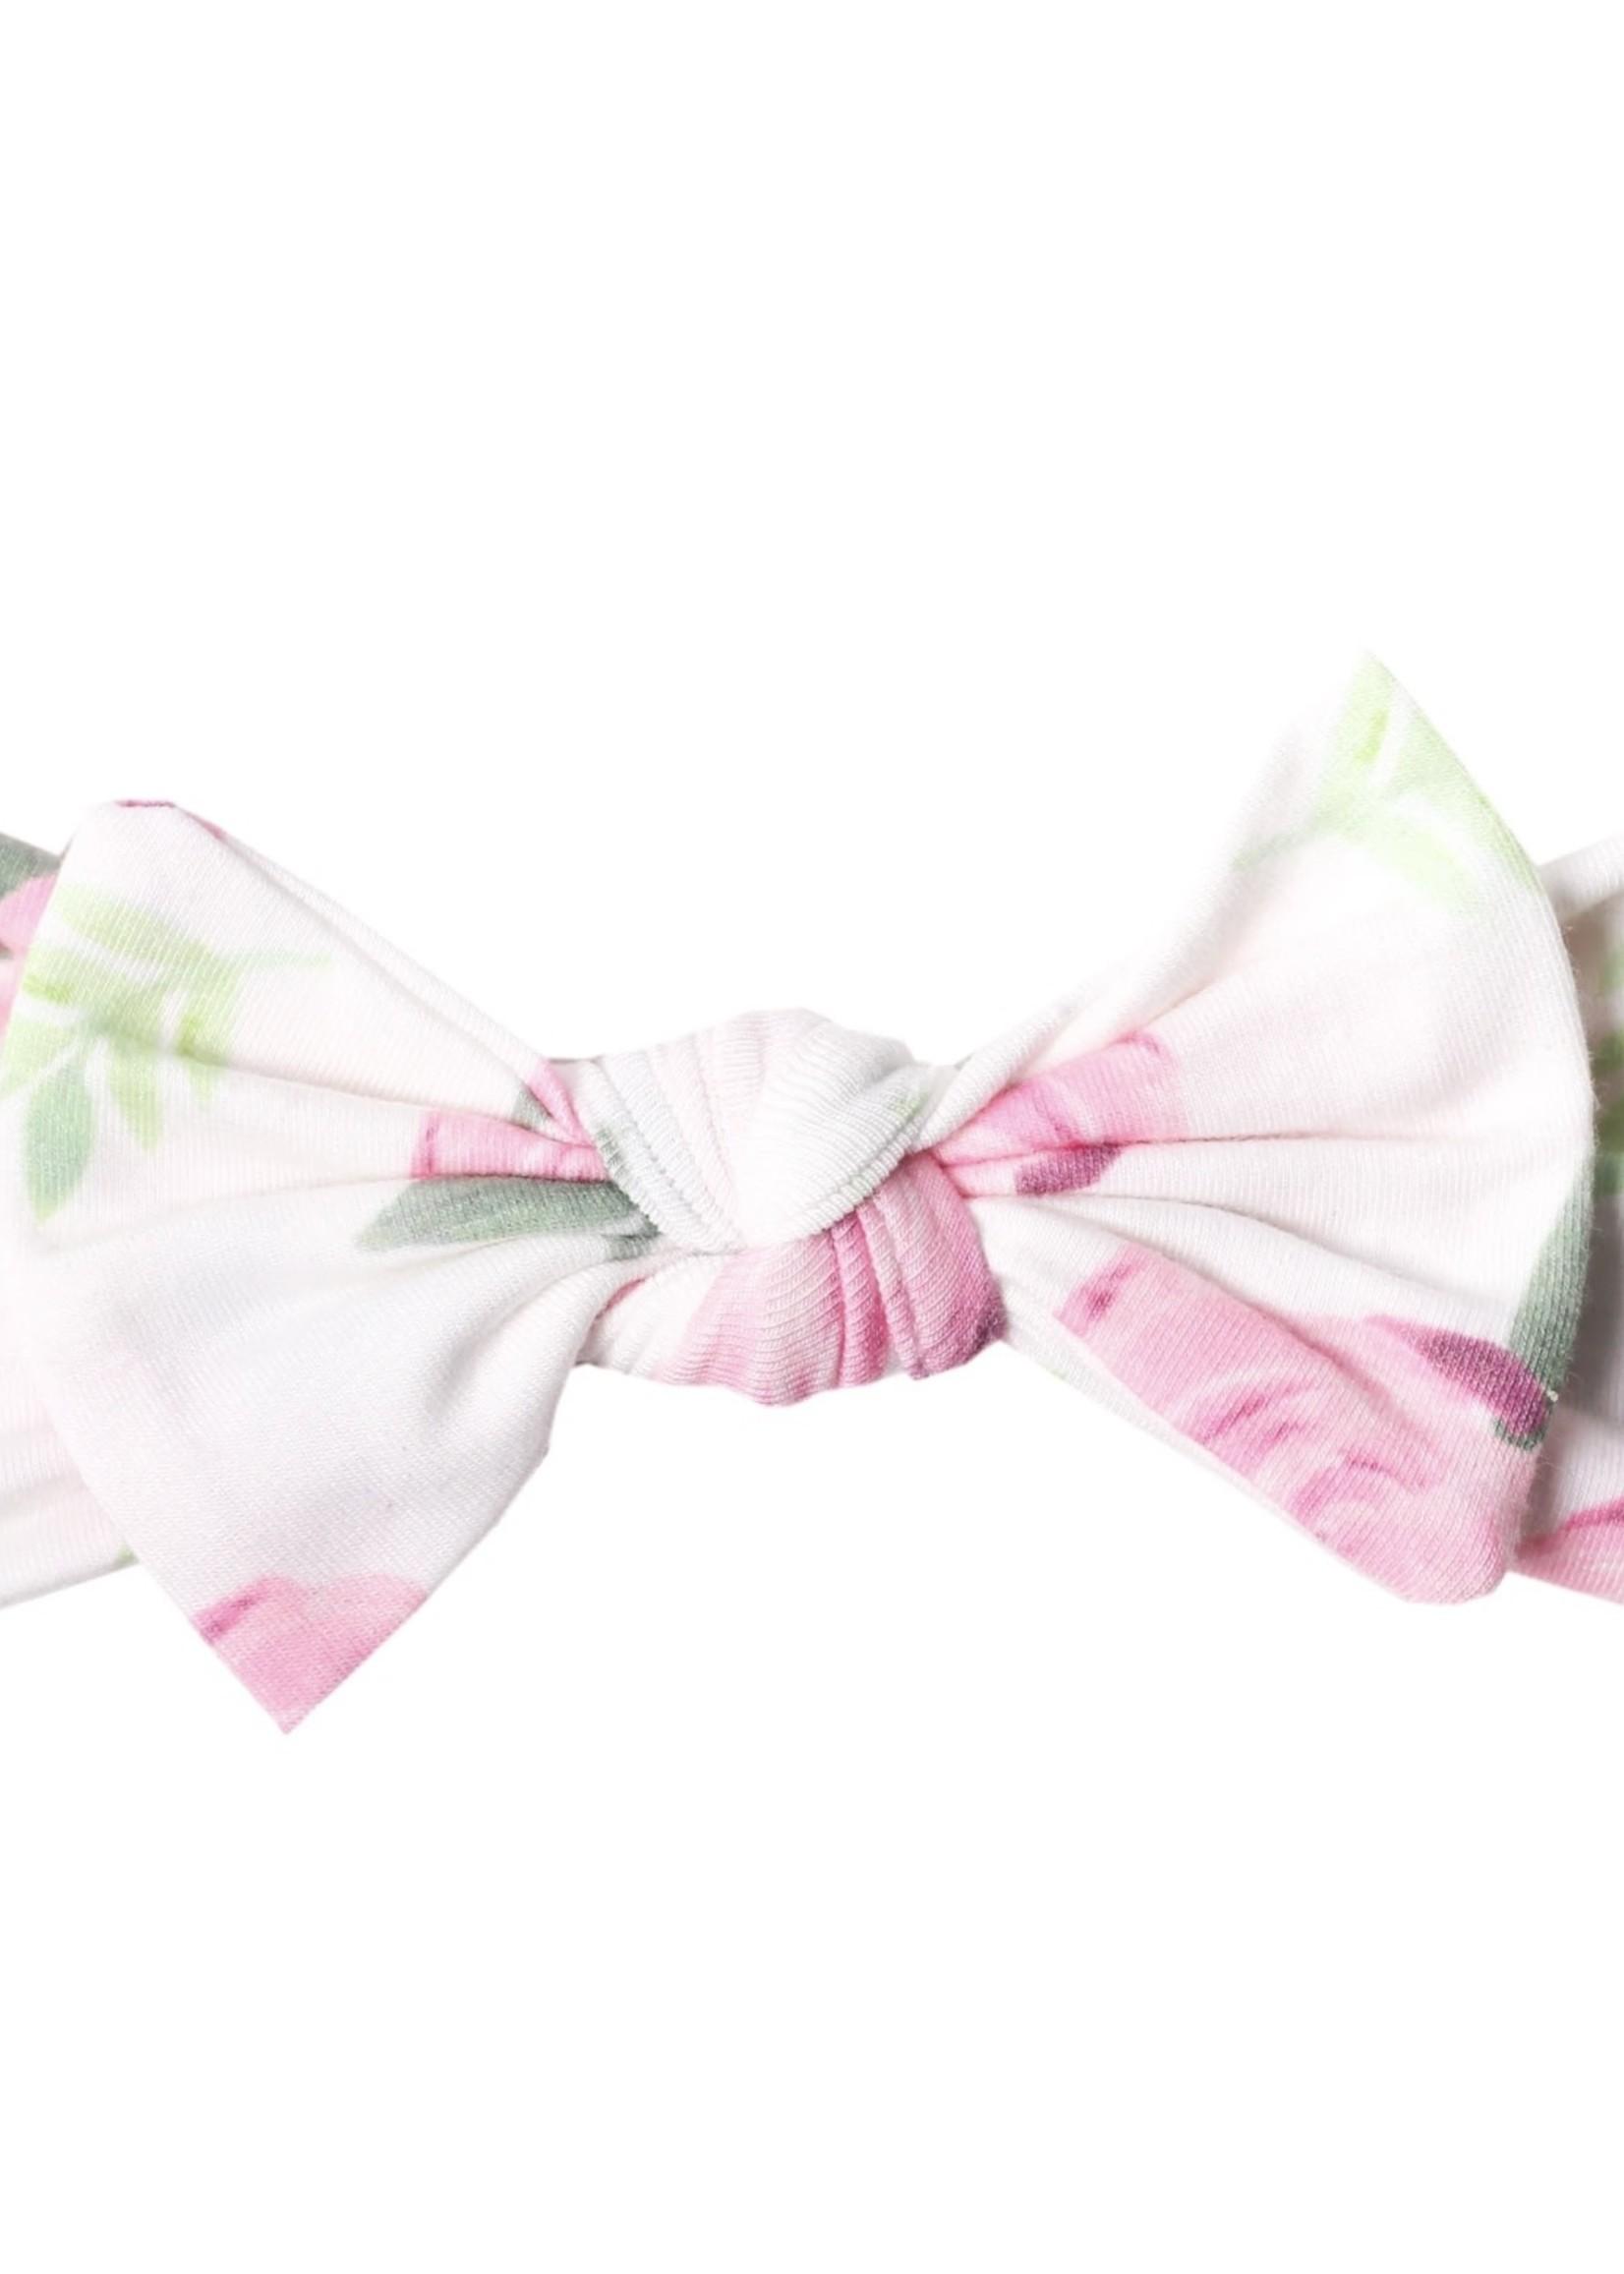 COPPER PEARL Knit Headband Bow GRACE